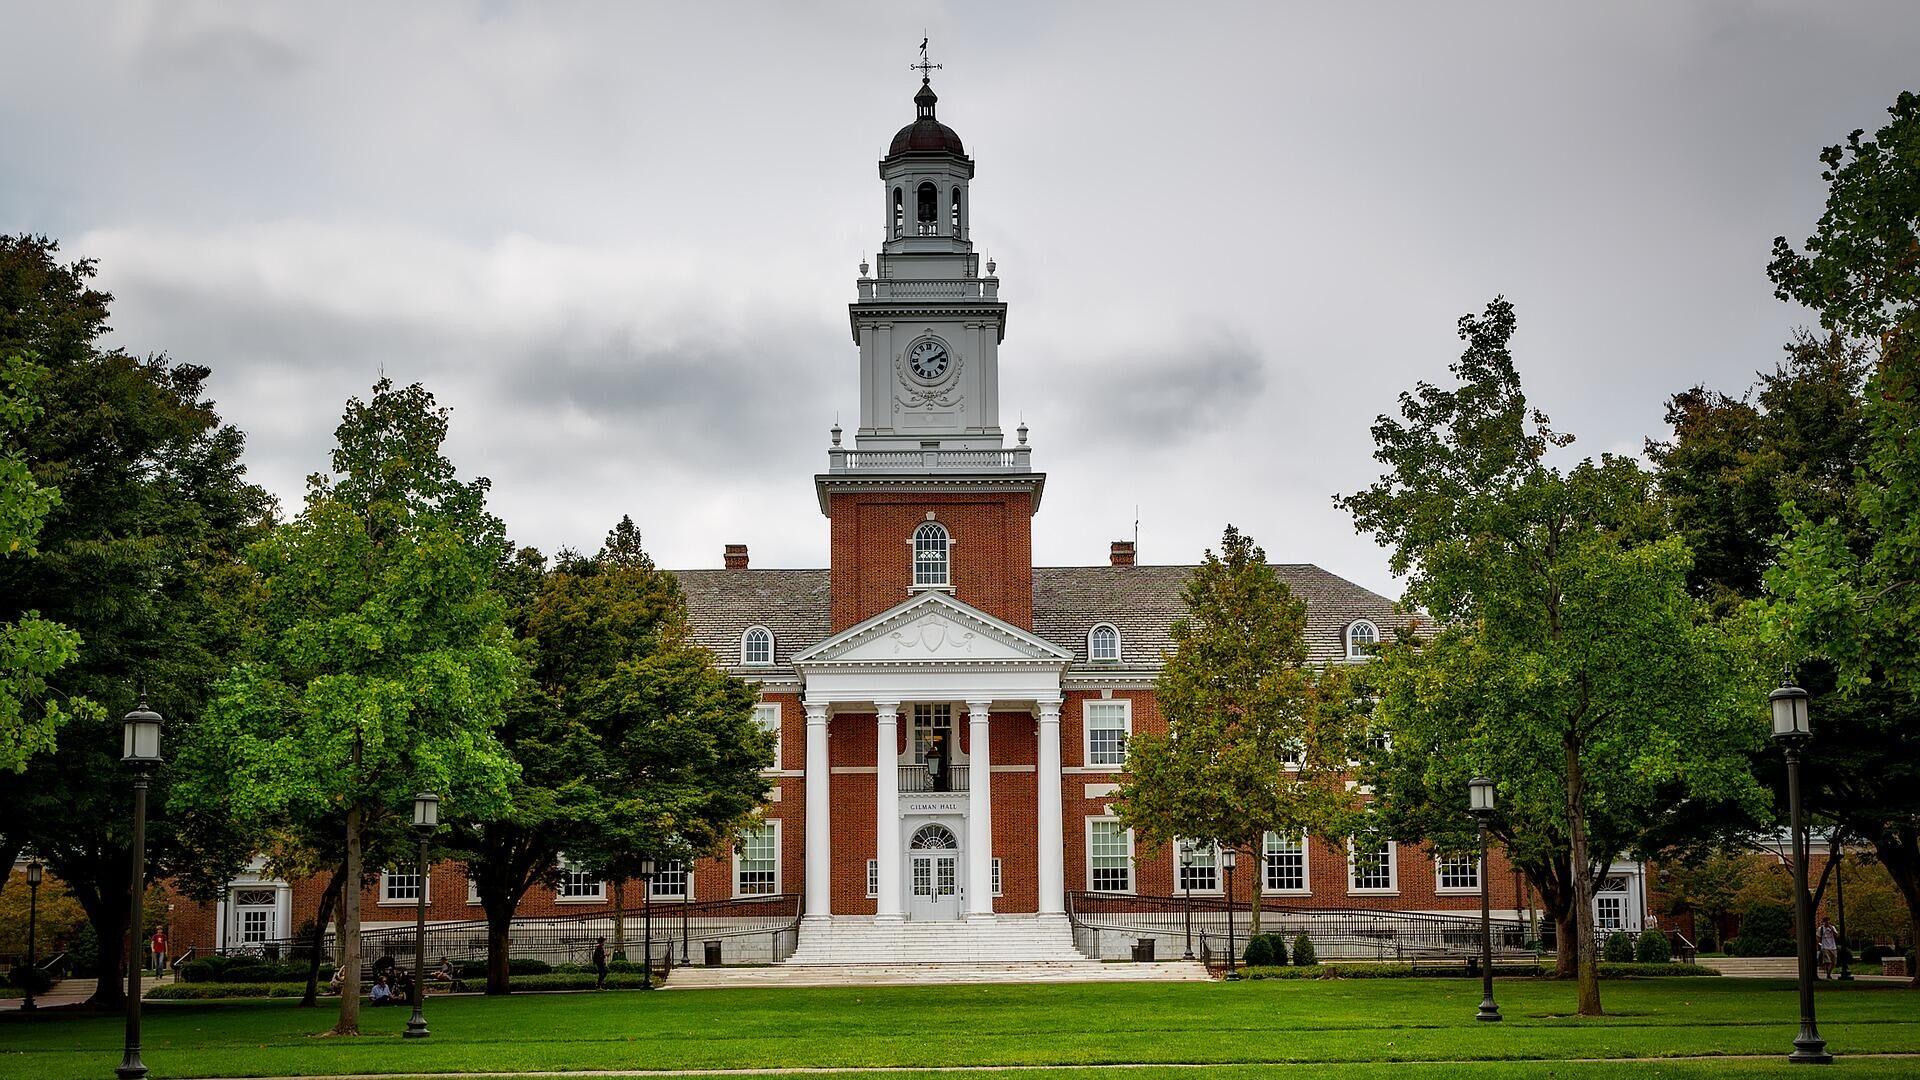 Johns Hopkins University - SNA, 1920, 15.07.2021